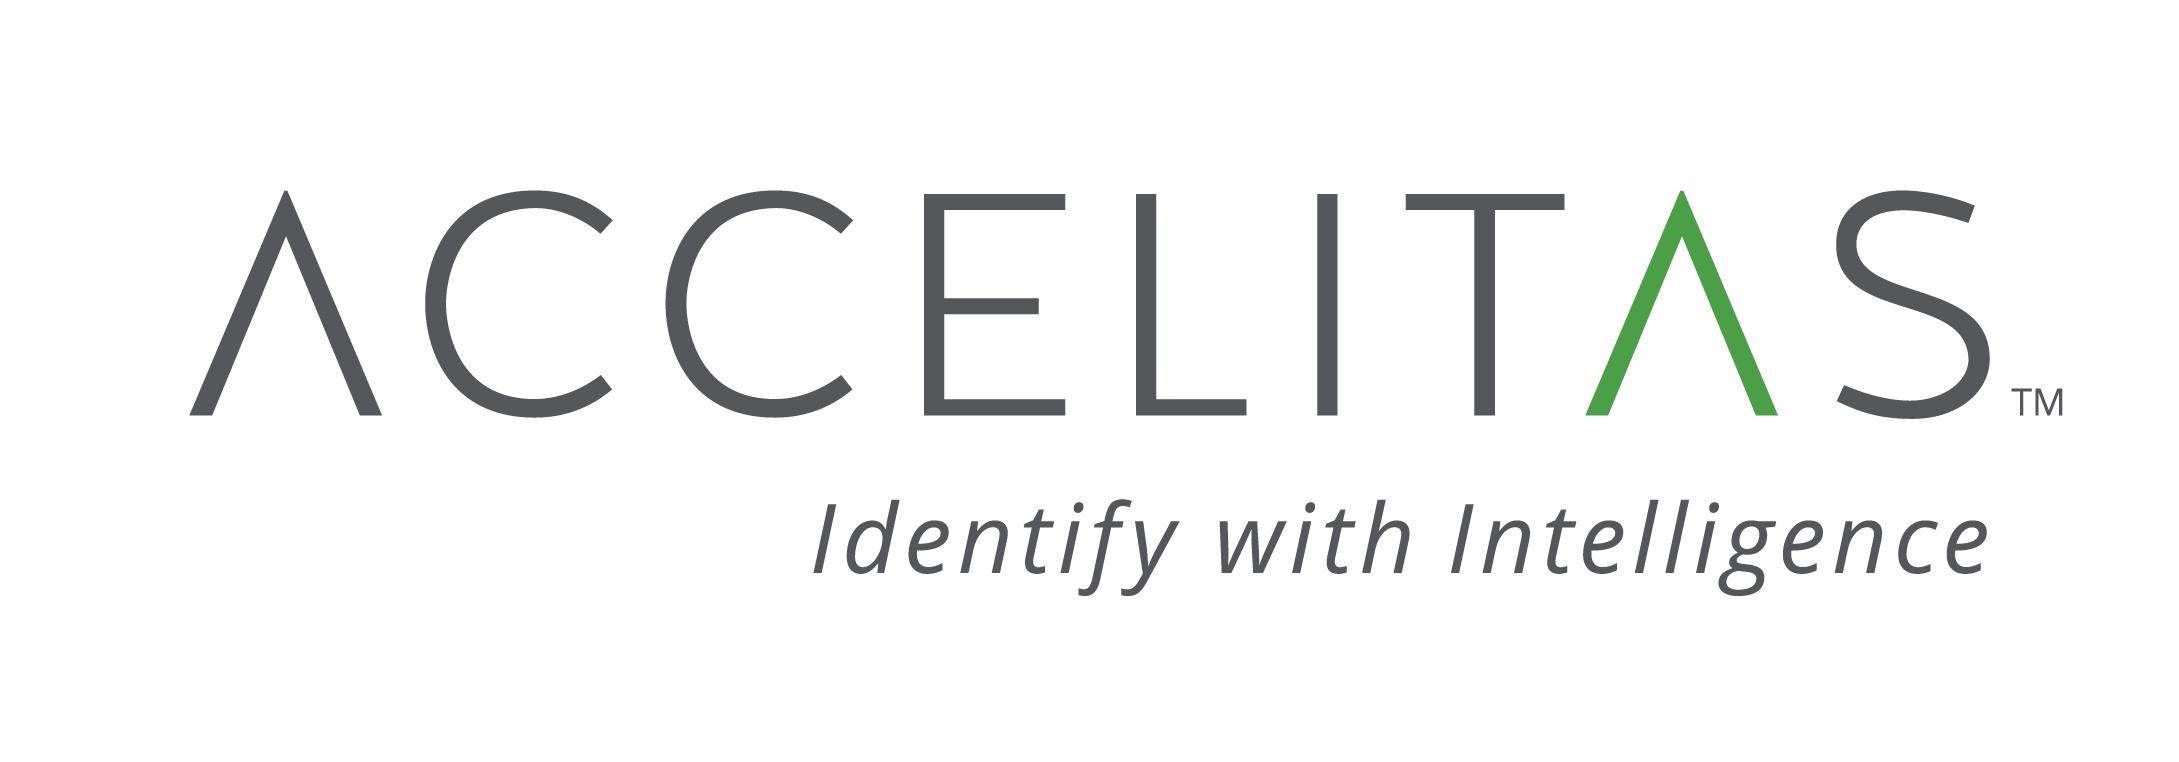 Accelitas Logo w-tagline.jpg